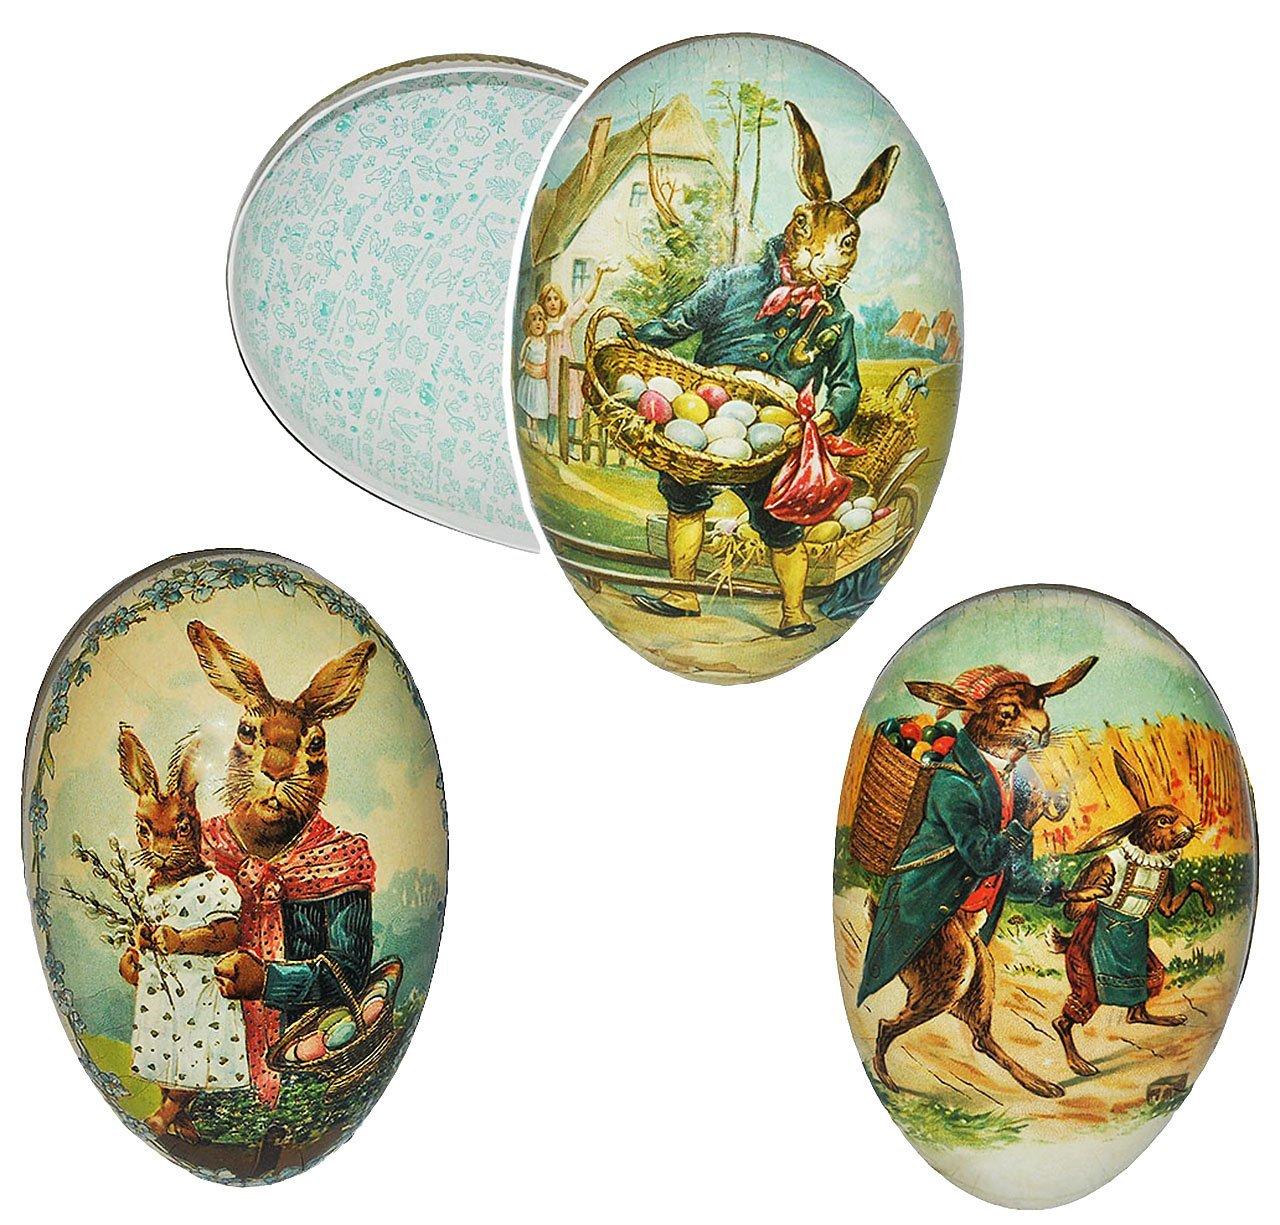 Unbekannt 10 Stück _ Füll - Pappeier 15 cm - - -  Landidylle Hasen  - Osterei   Ei zum befüllen - Deko Pappe Papp Pappeier Dekoei Pappostereier Füllen - Os.. B01BKVIQ7G Ostern 57aee1